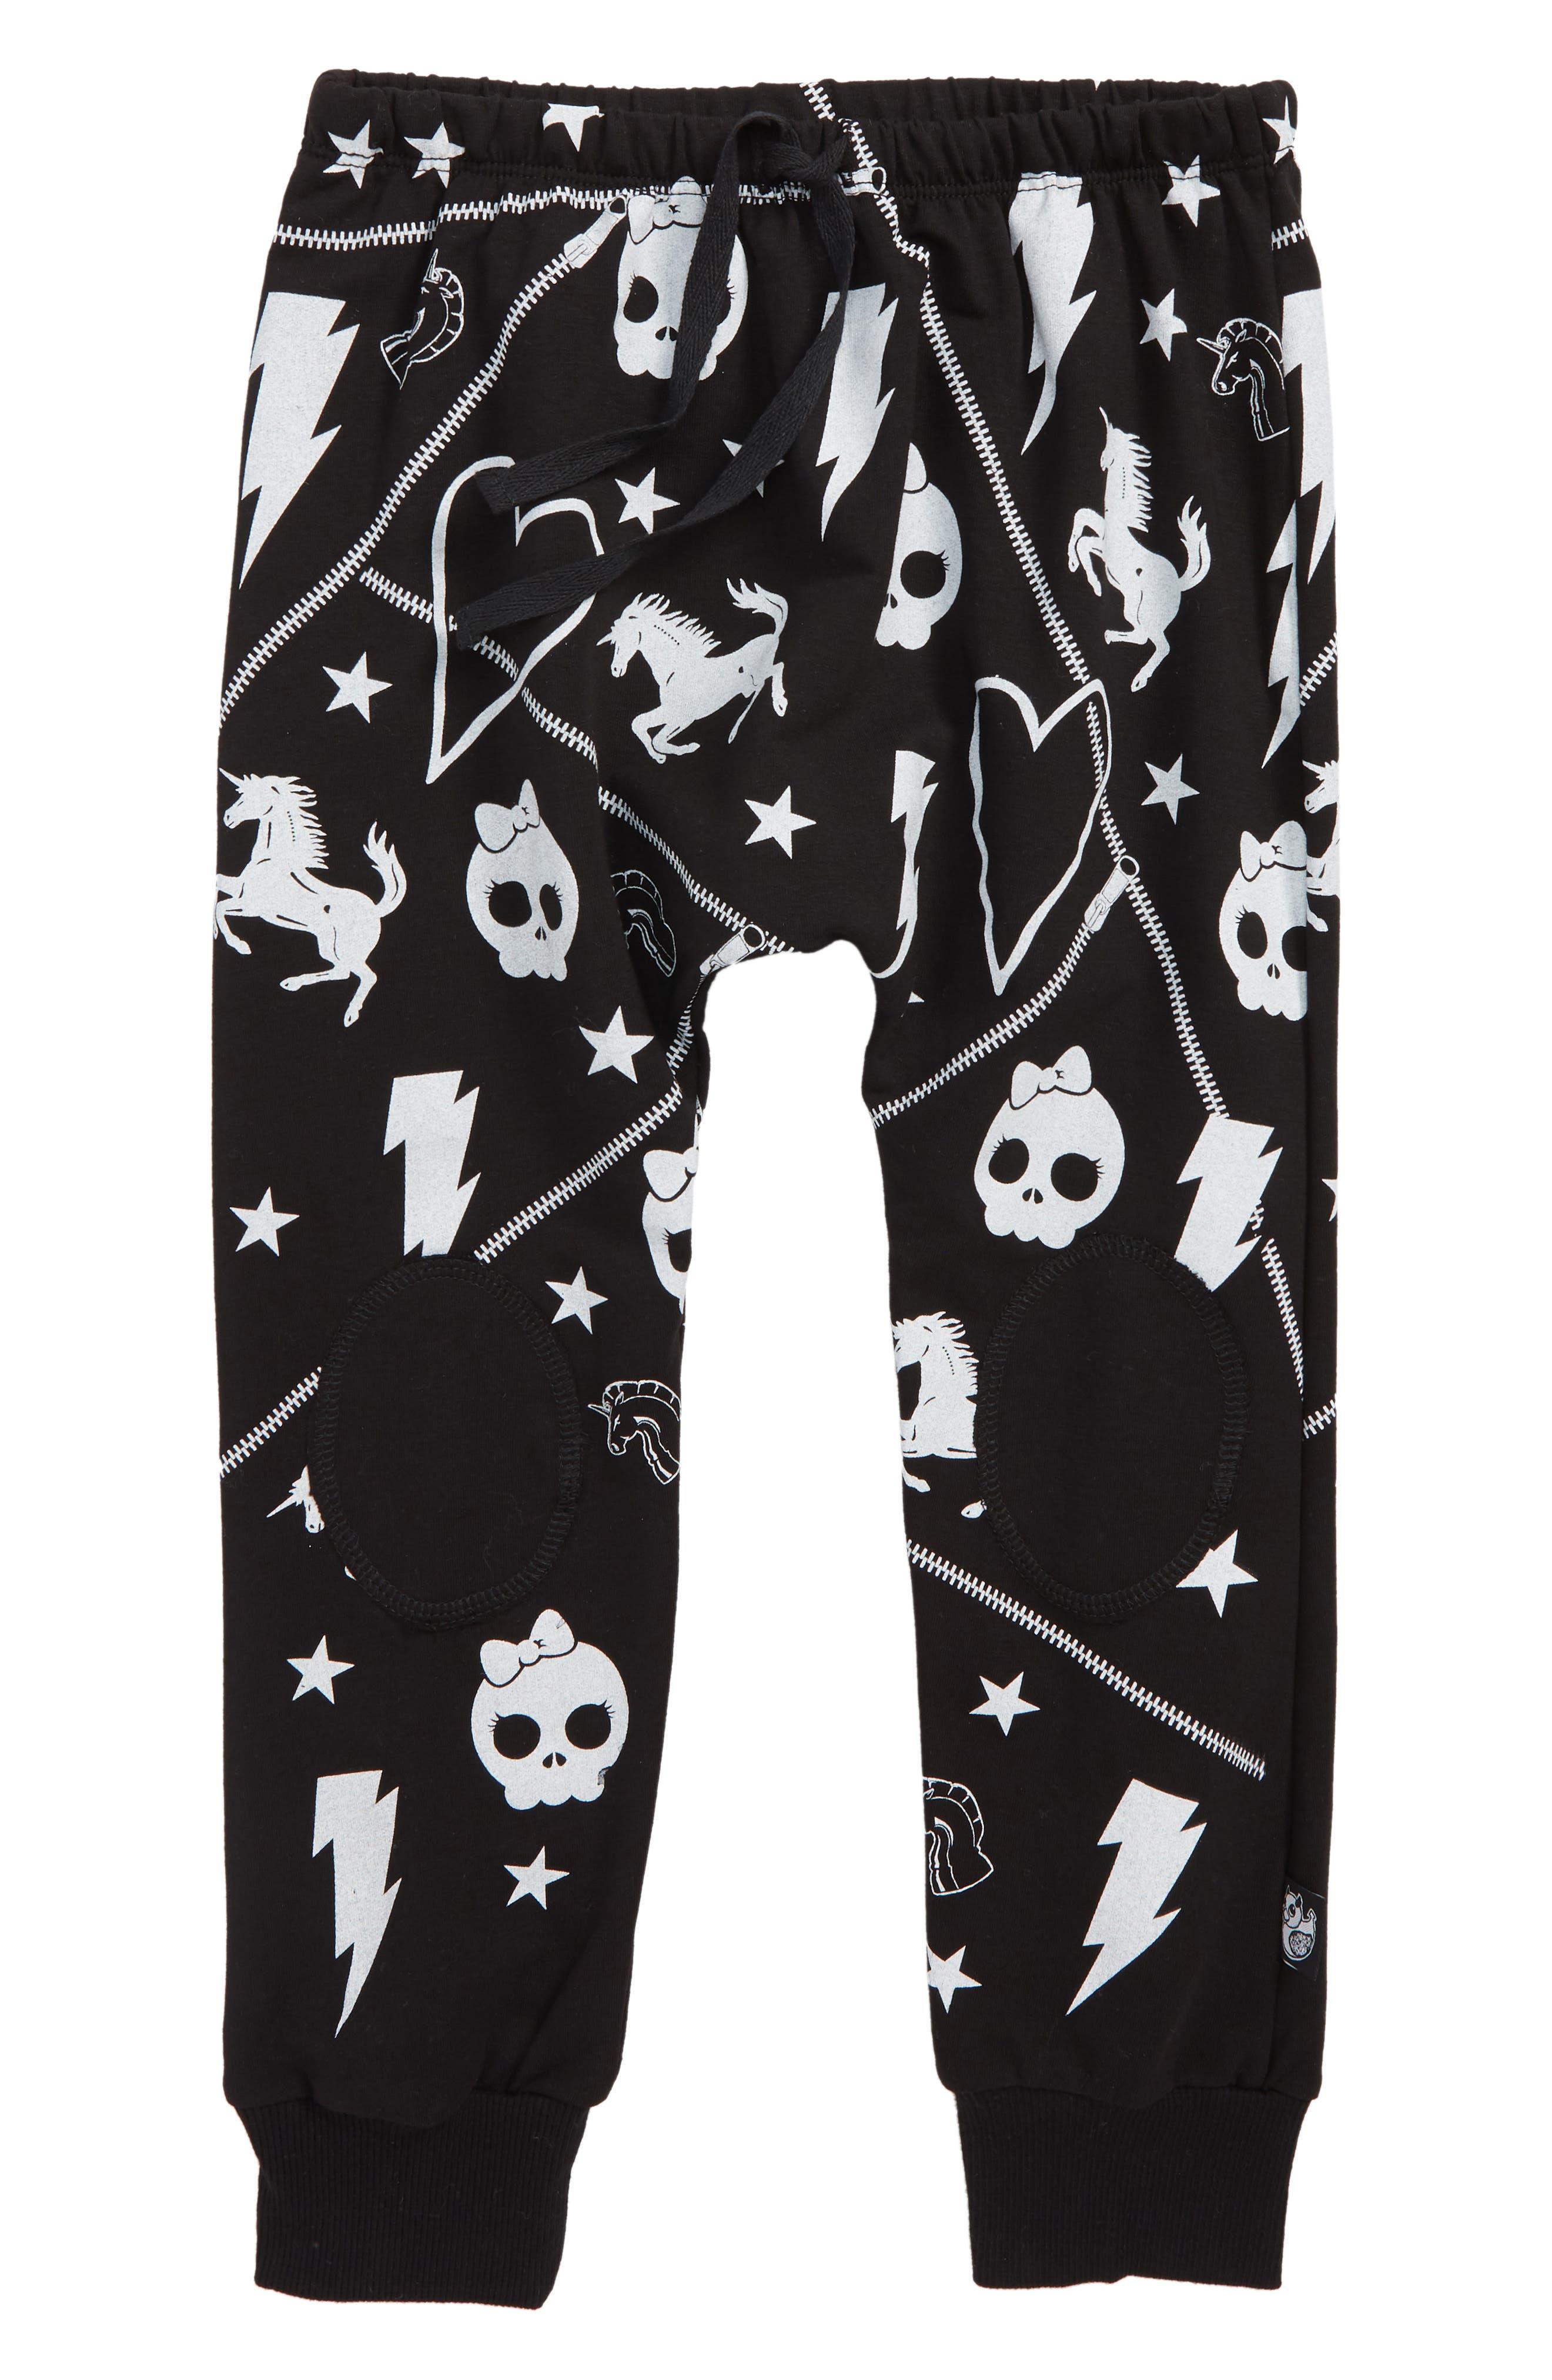 Skulls and Stars Sweatpants,                         Main,                         color, BLACK